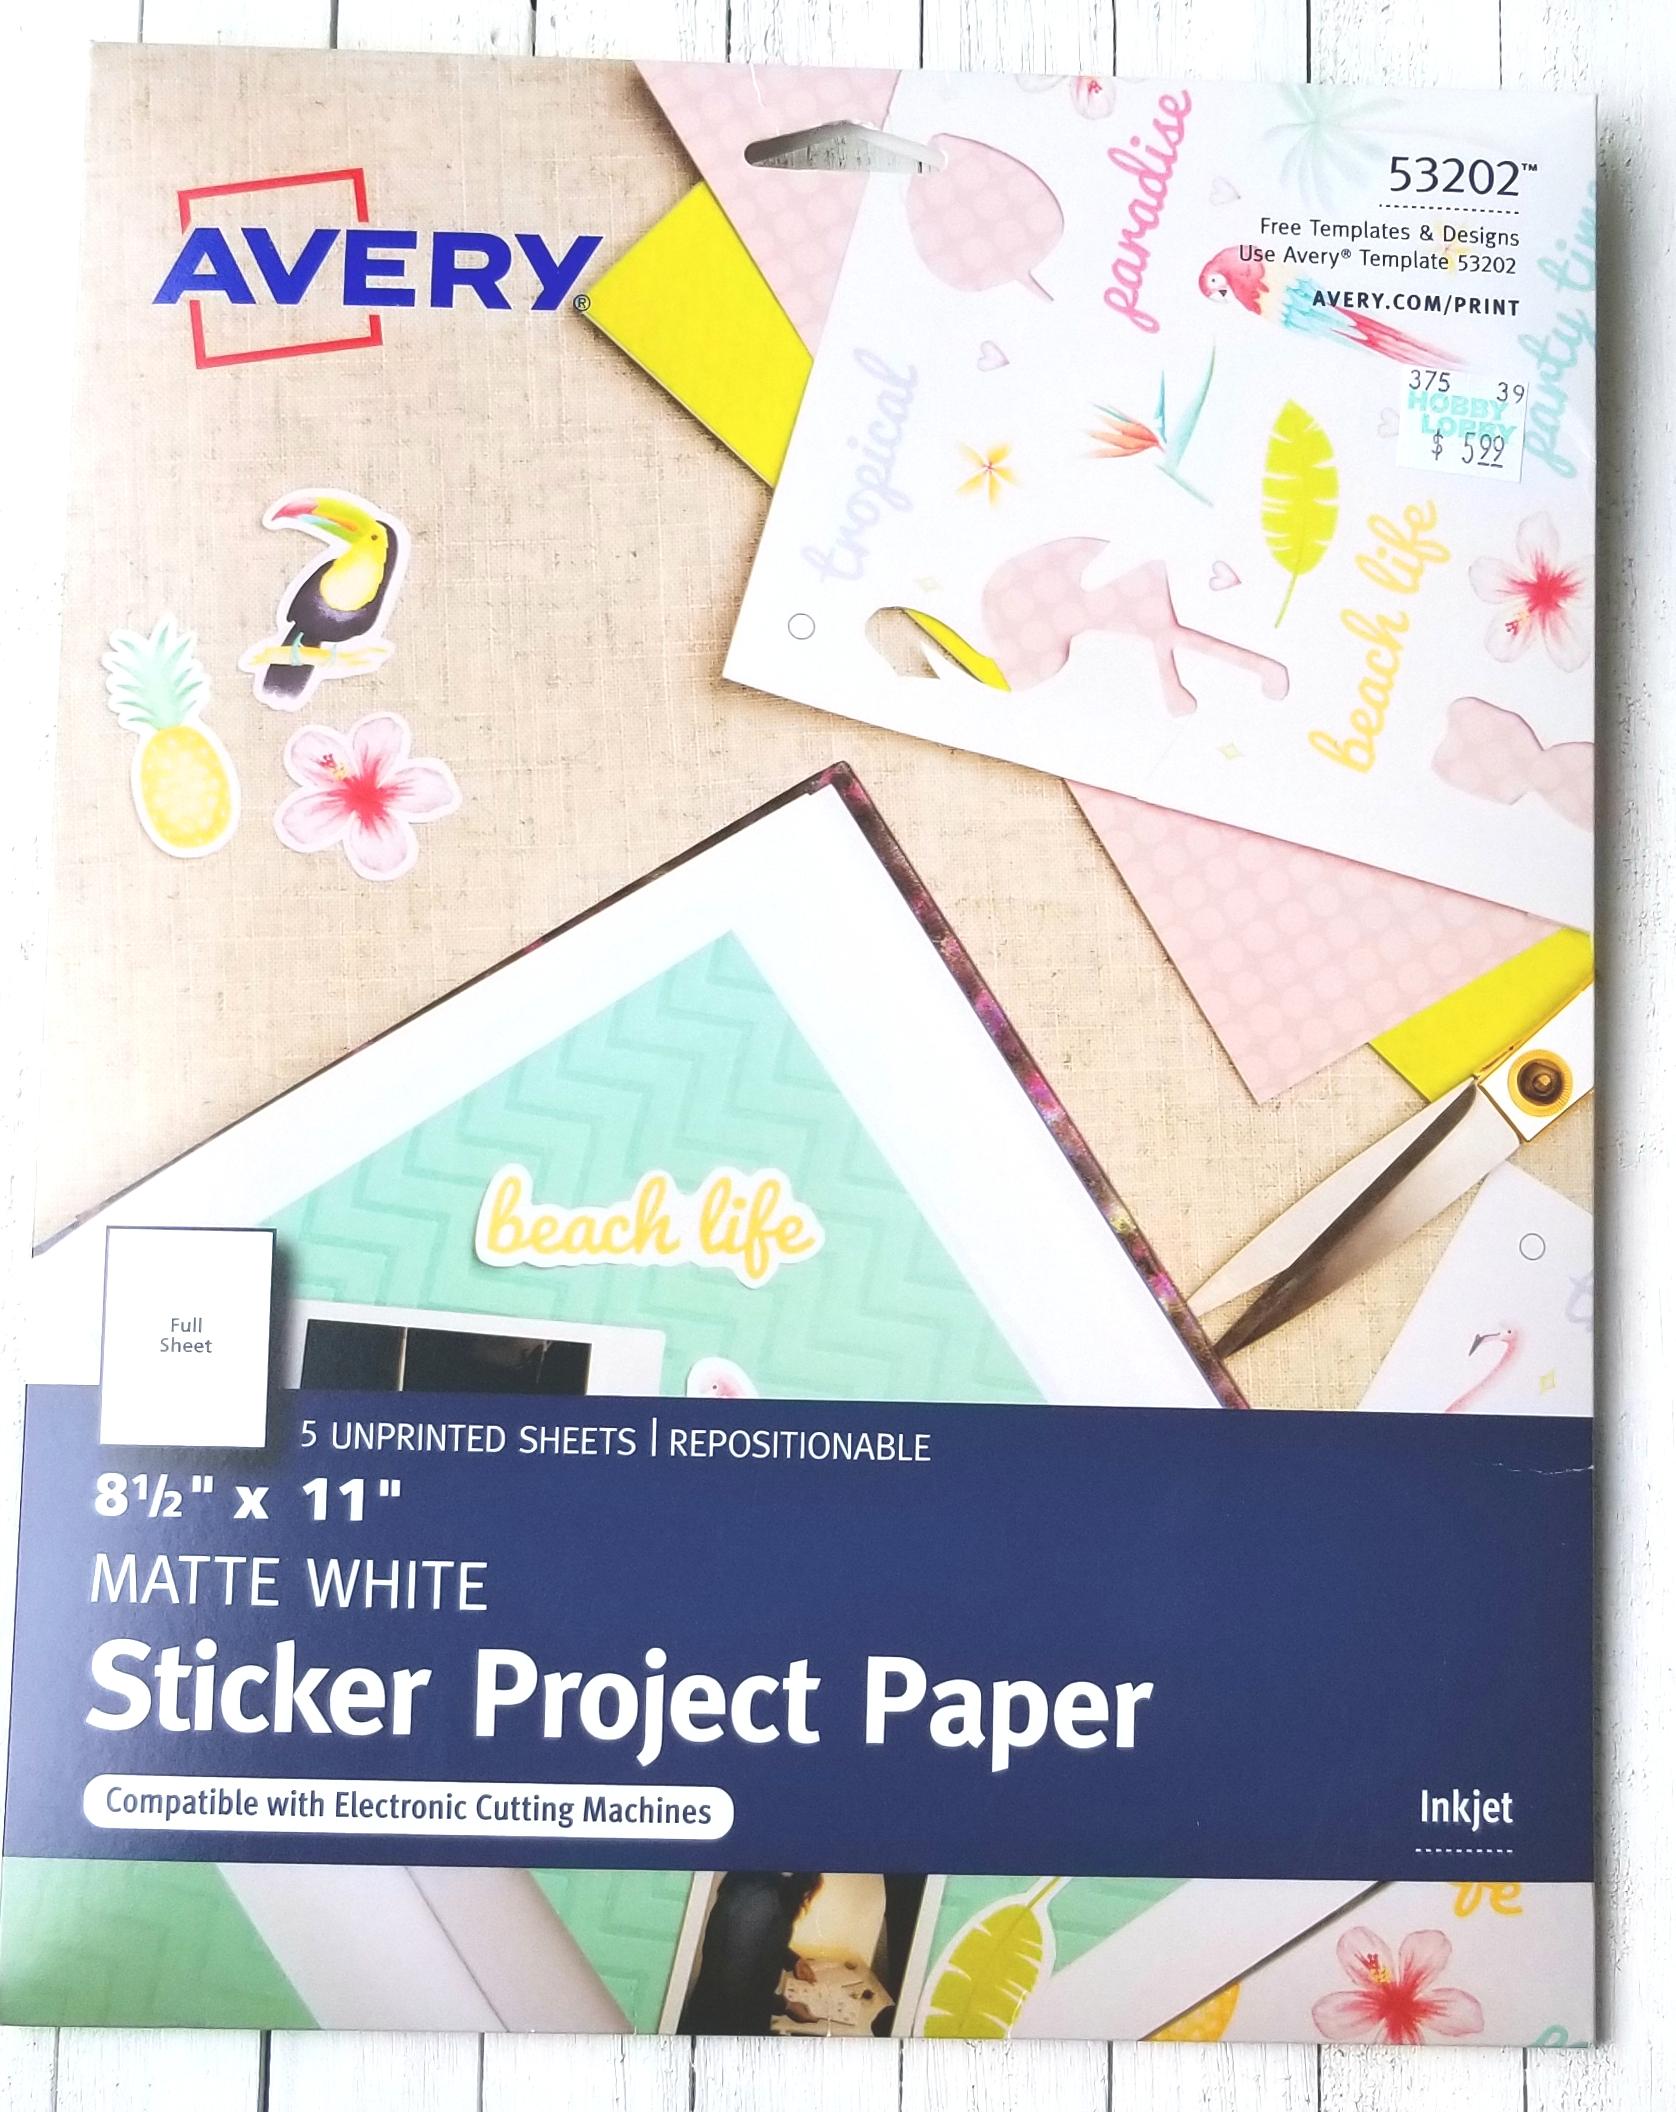 avery-sticker-paper.jpg